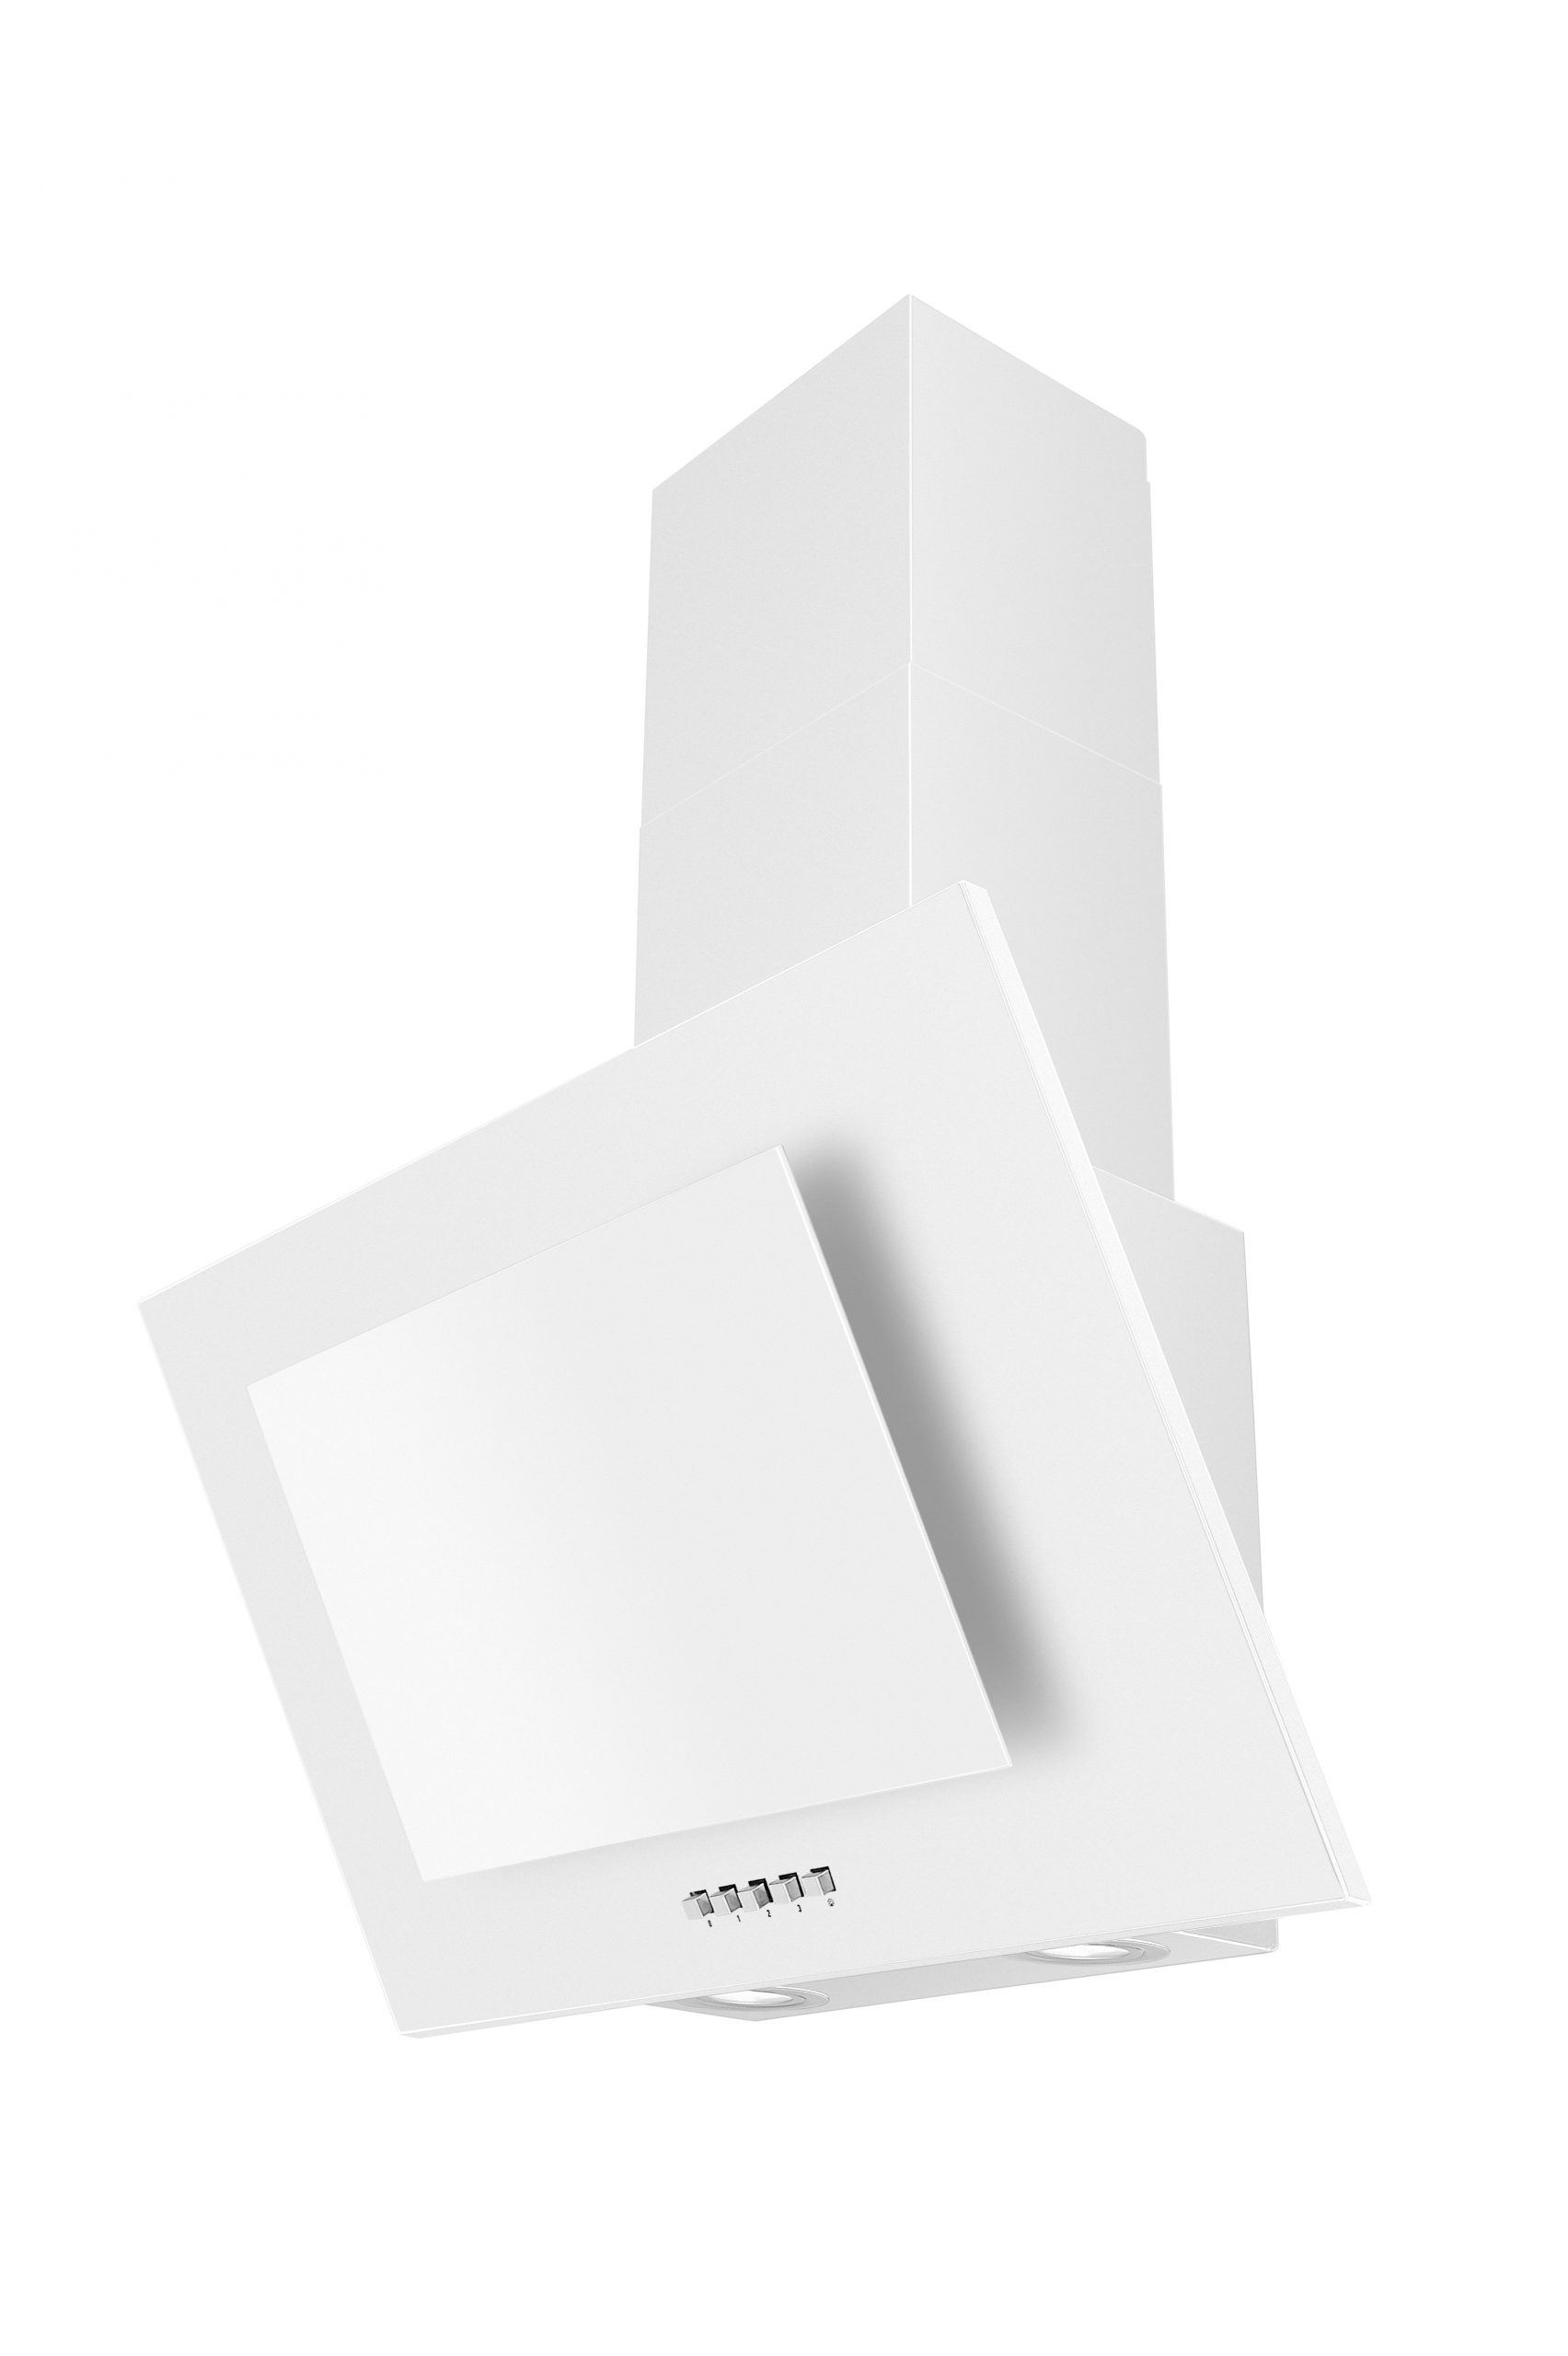 EVIDO REFLEX 60W - CHV6BW.1